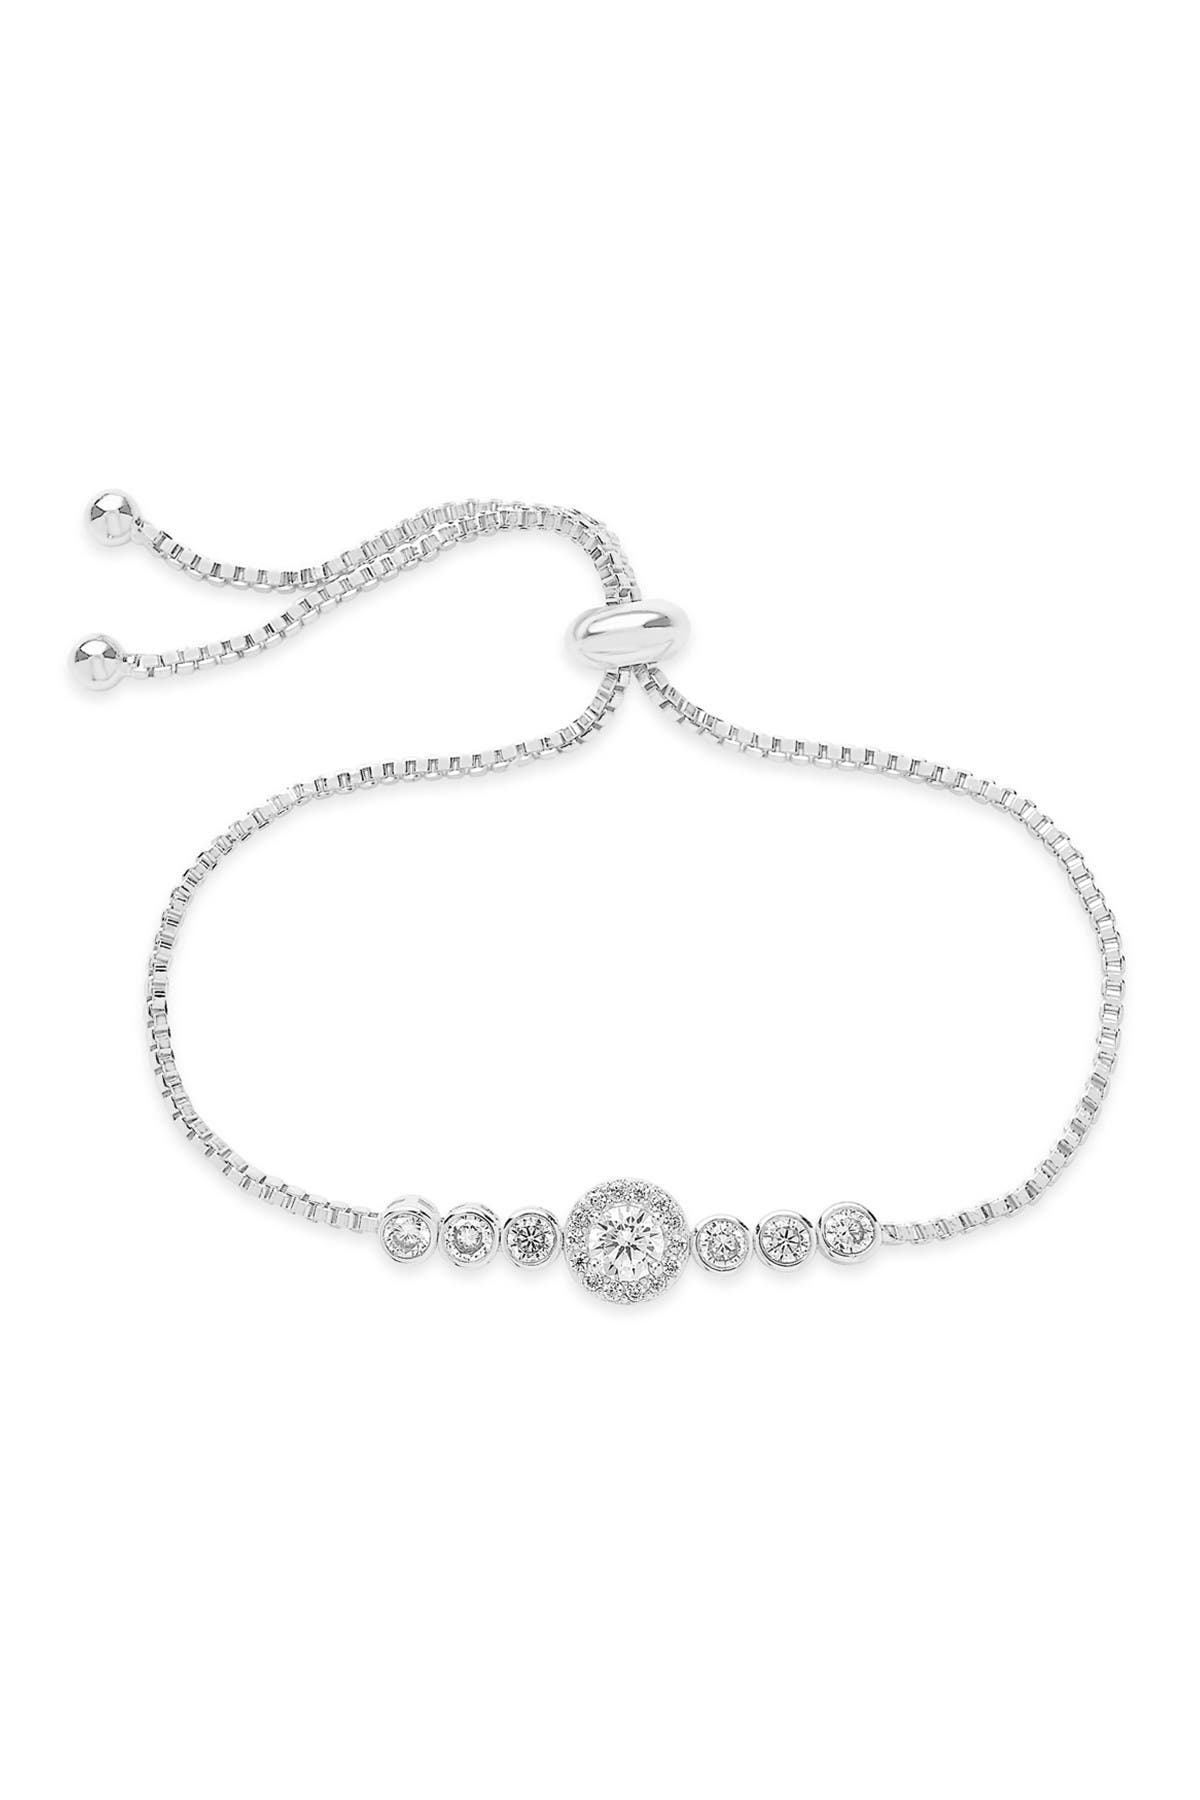 Image of Sterling Forever Rhodium Plated CZ Circlet Bolo Bracelet